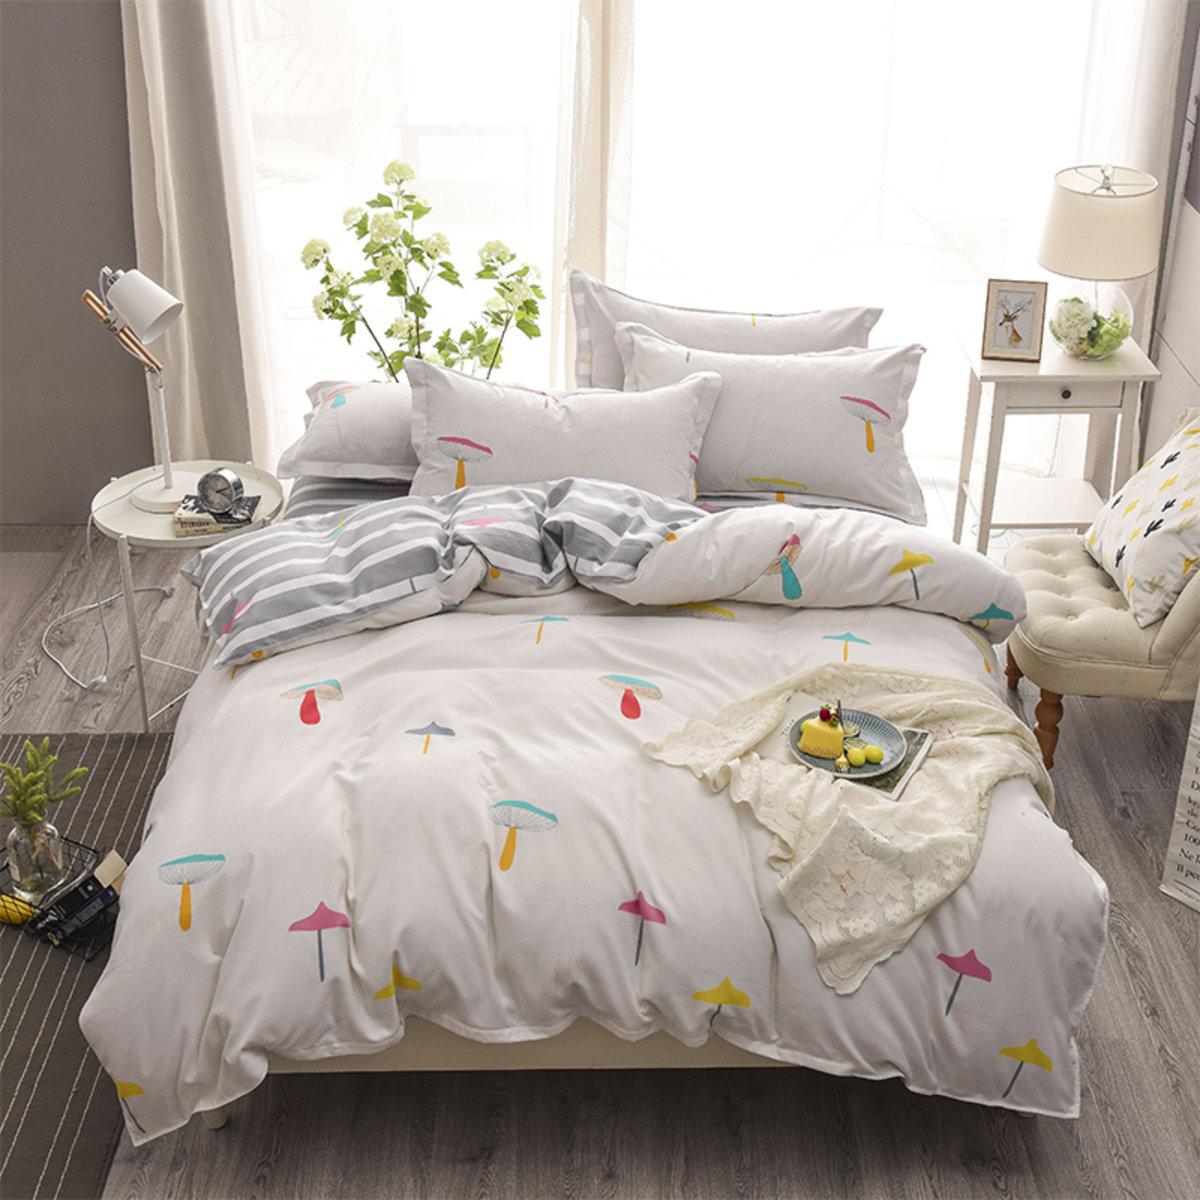 1560 bedding dream single